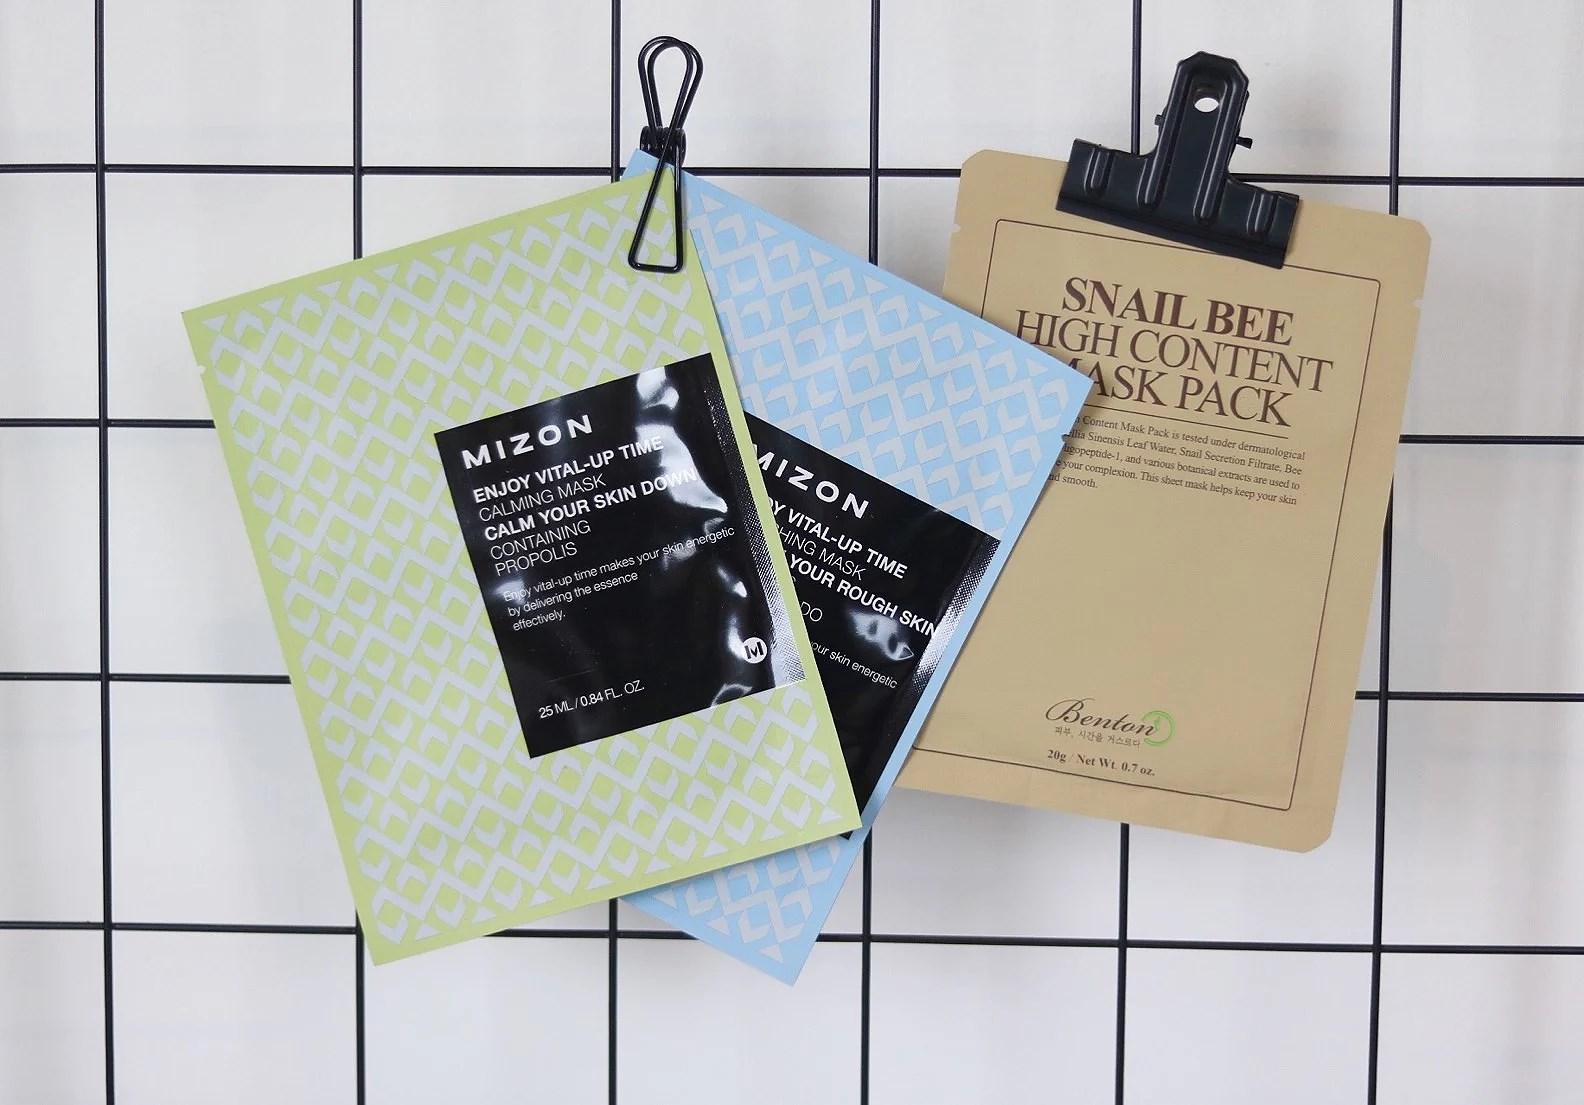 sheetmask benton och mizon